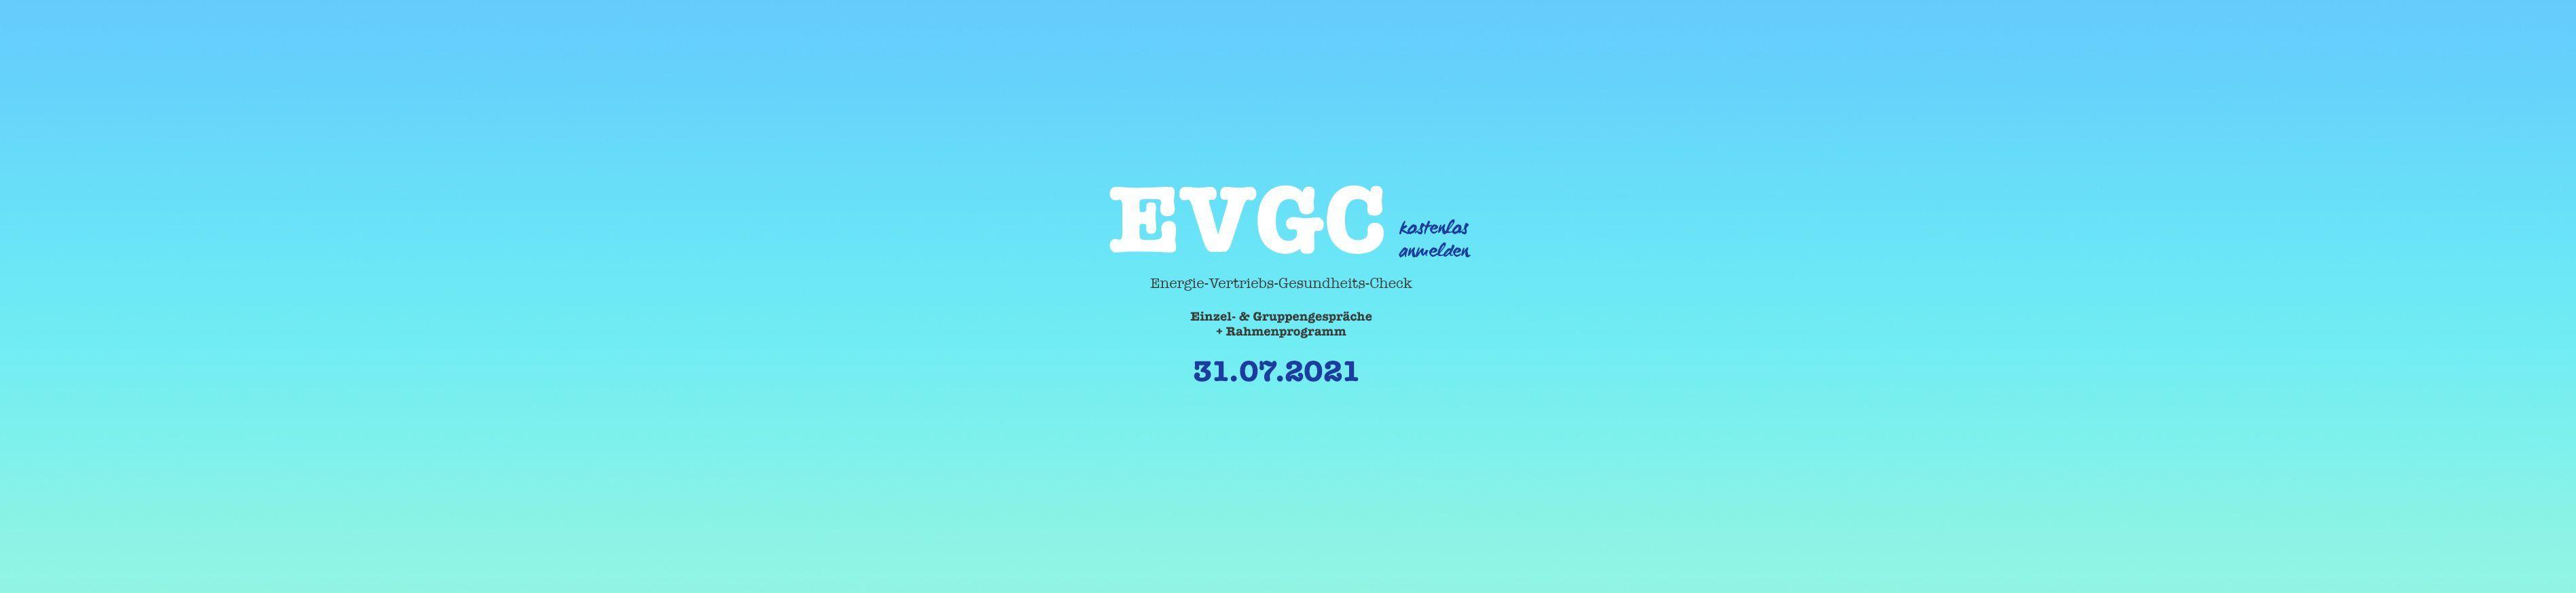 Rahmenprogramm / Zeitplan - EVGC -